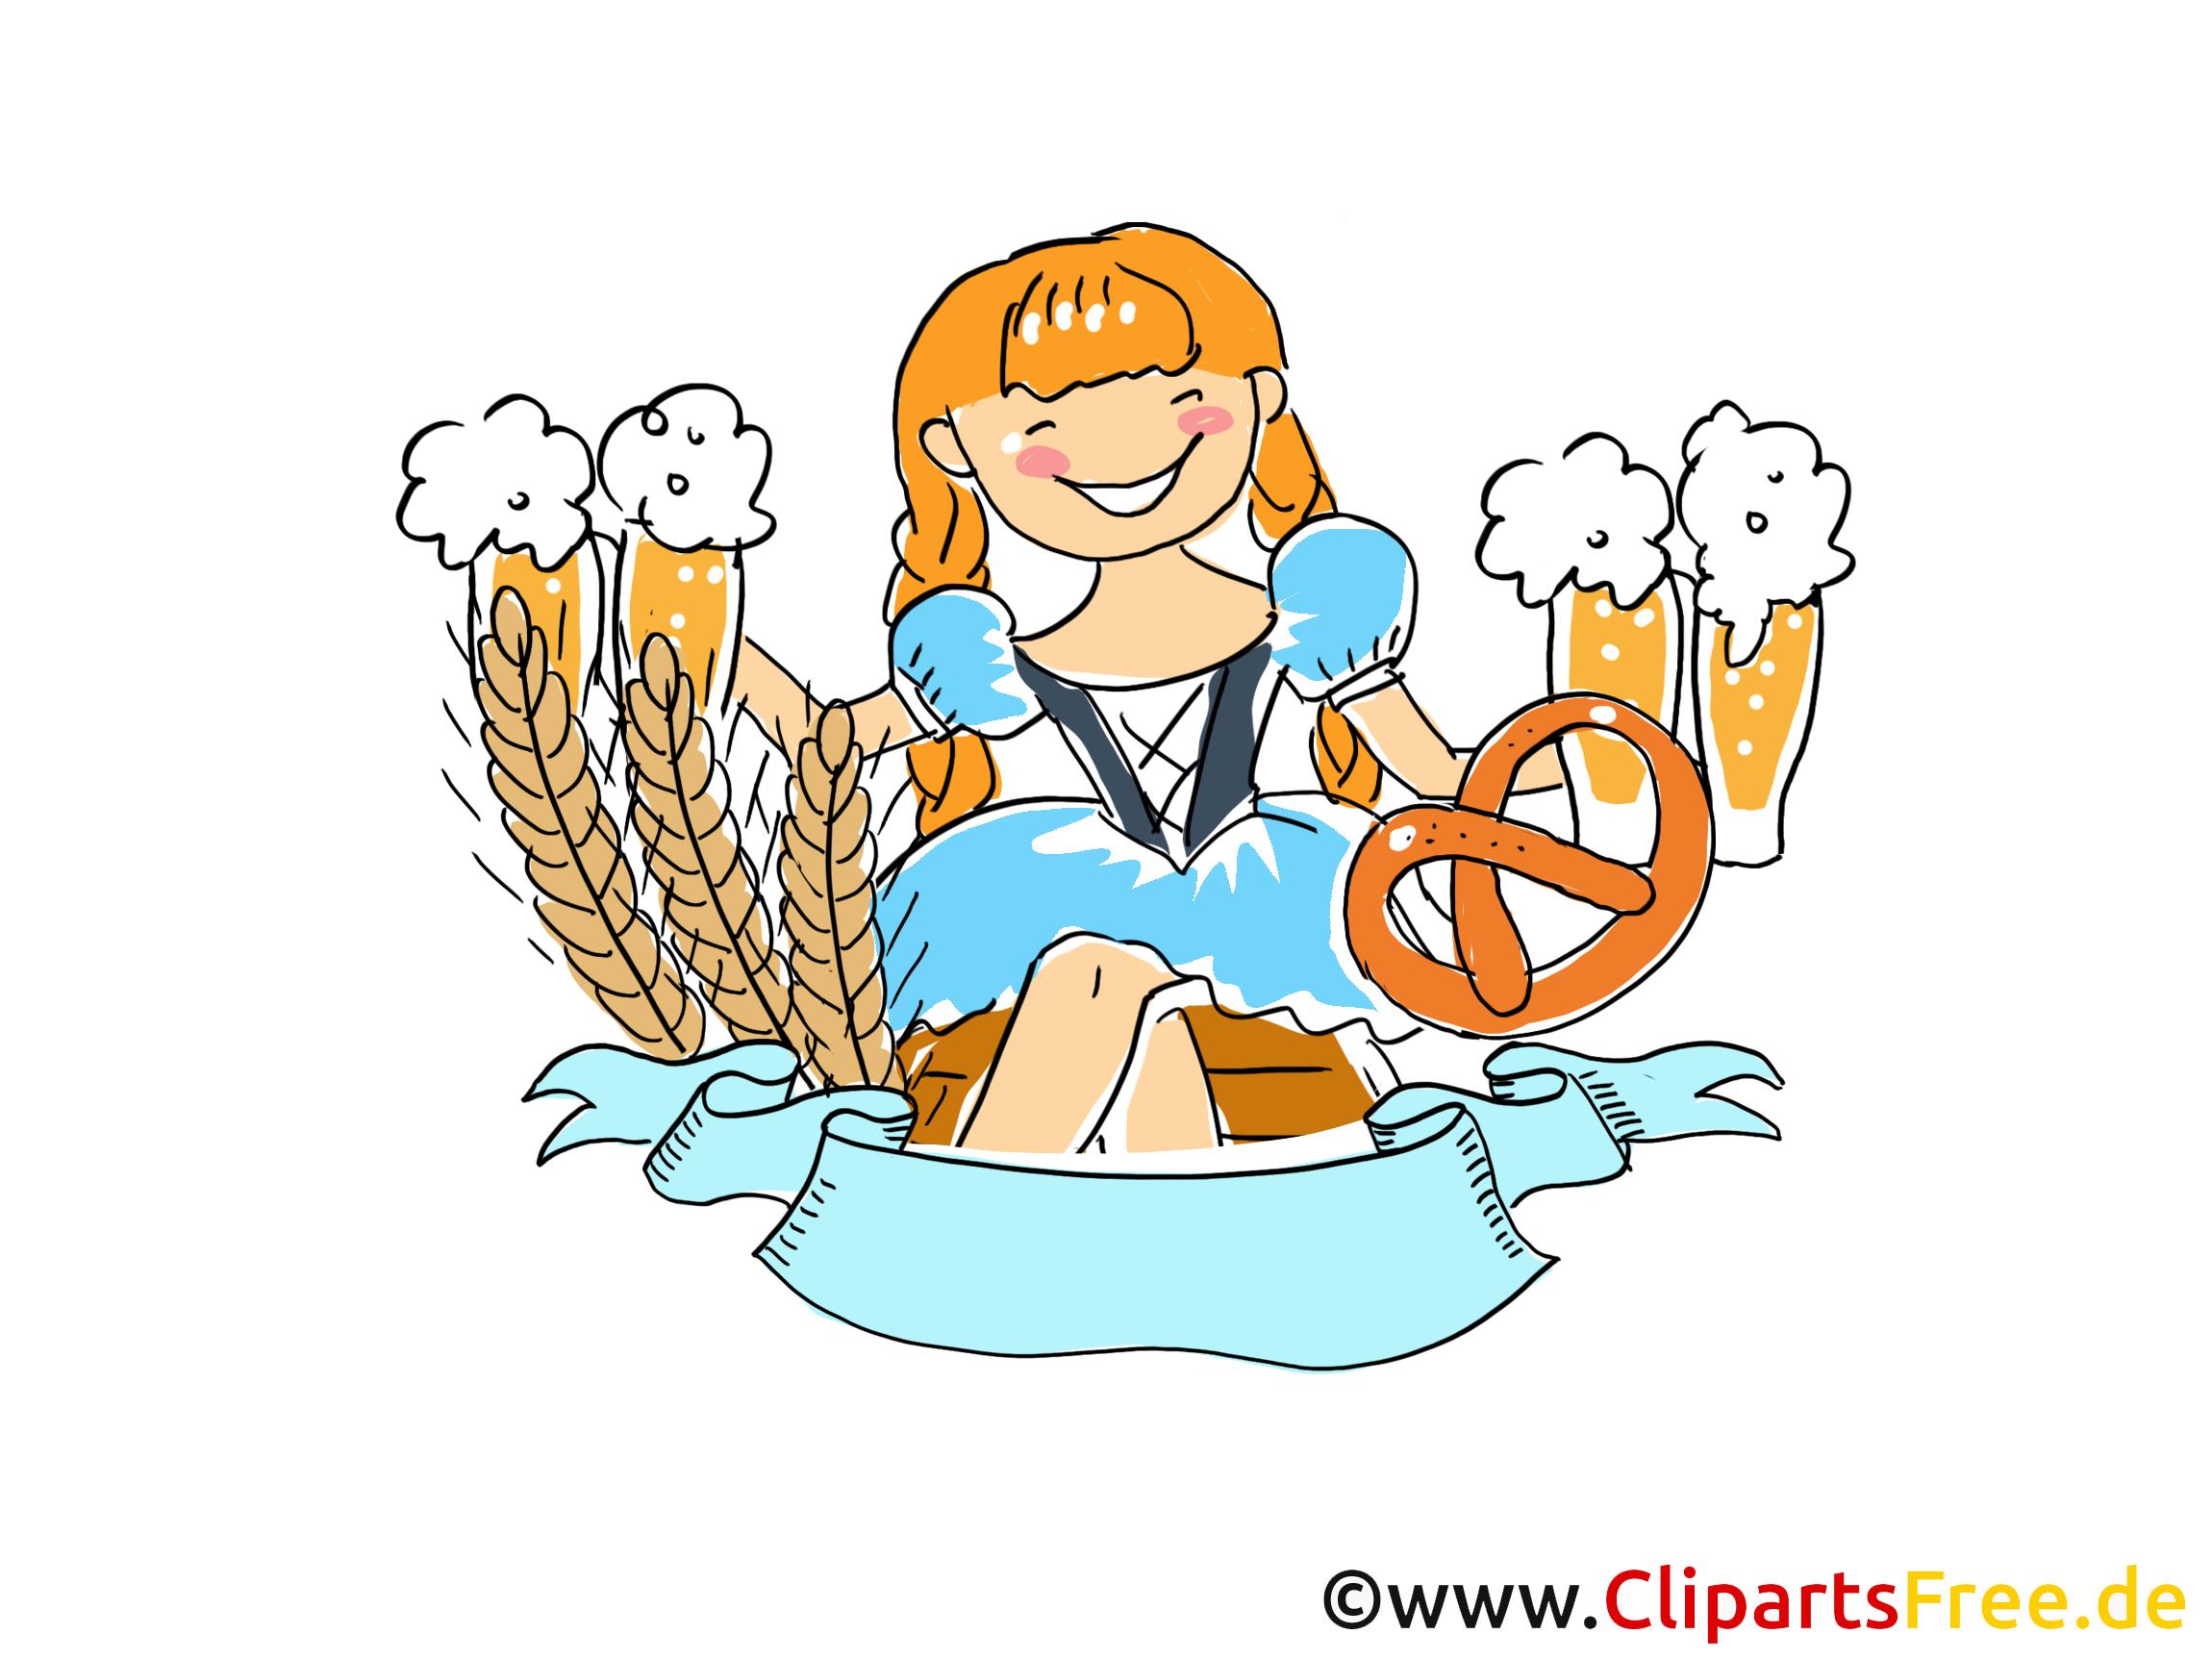 Oktoberfest in München Clipart, Bild, Grafik, Illustration, Comic, Cartoon gratis